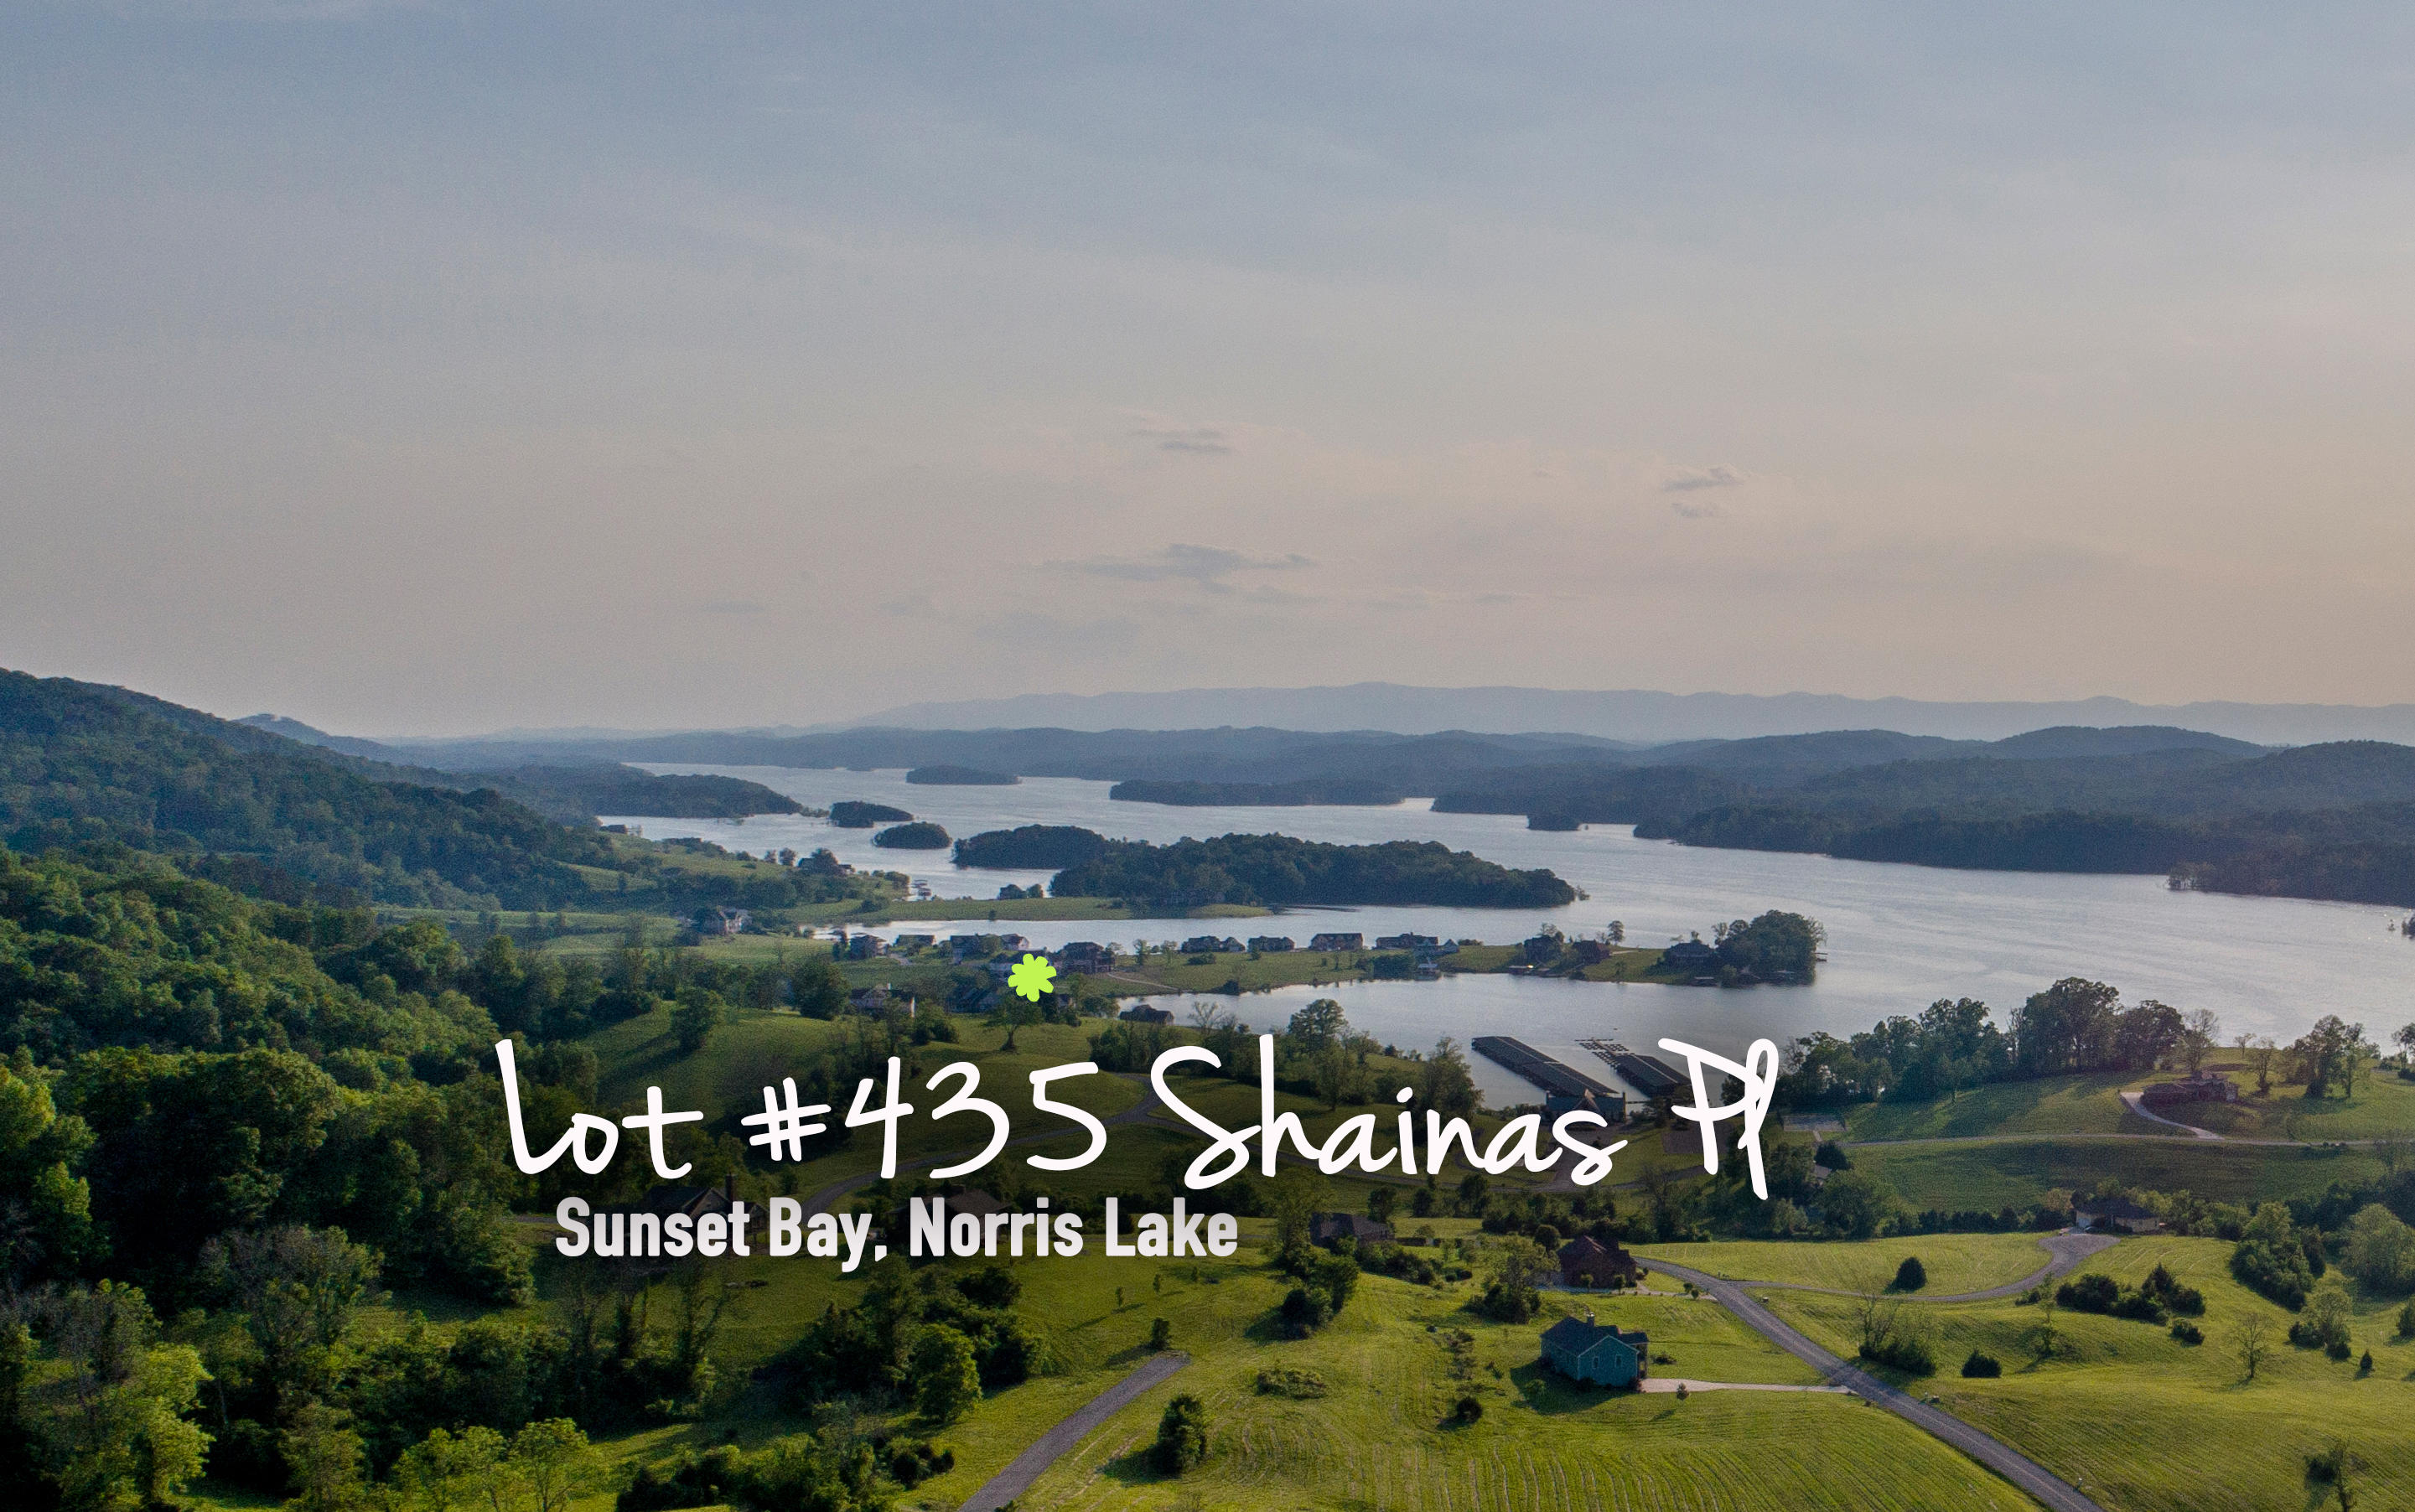 Lot 435 Shainas Place: